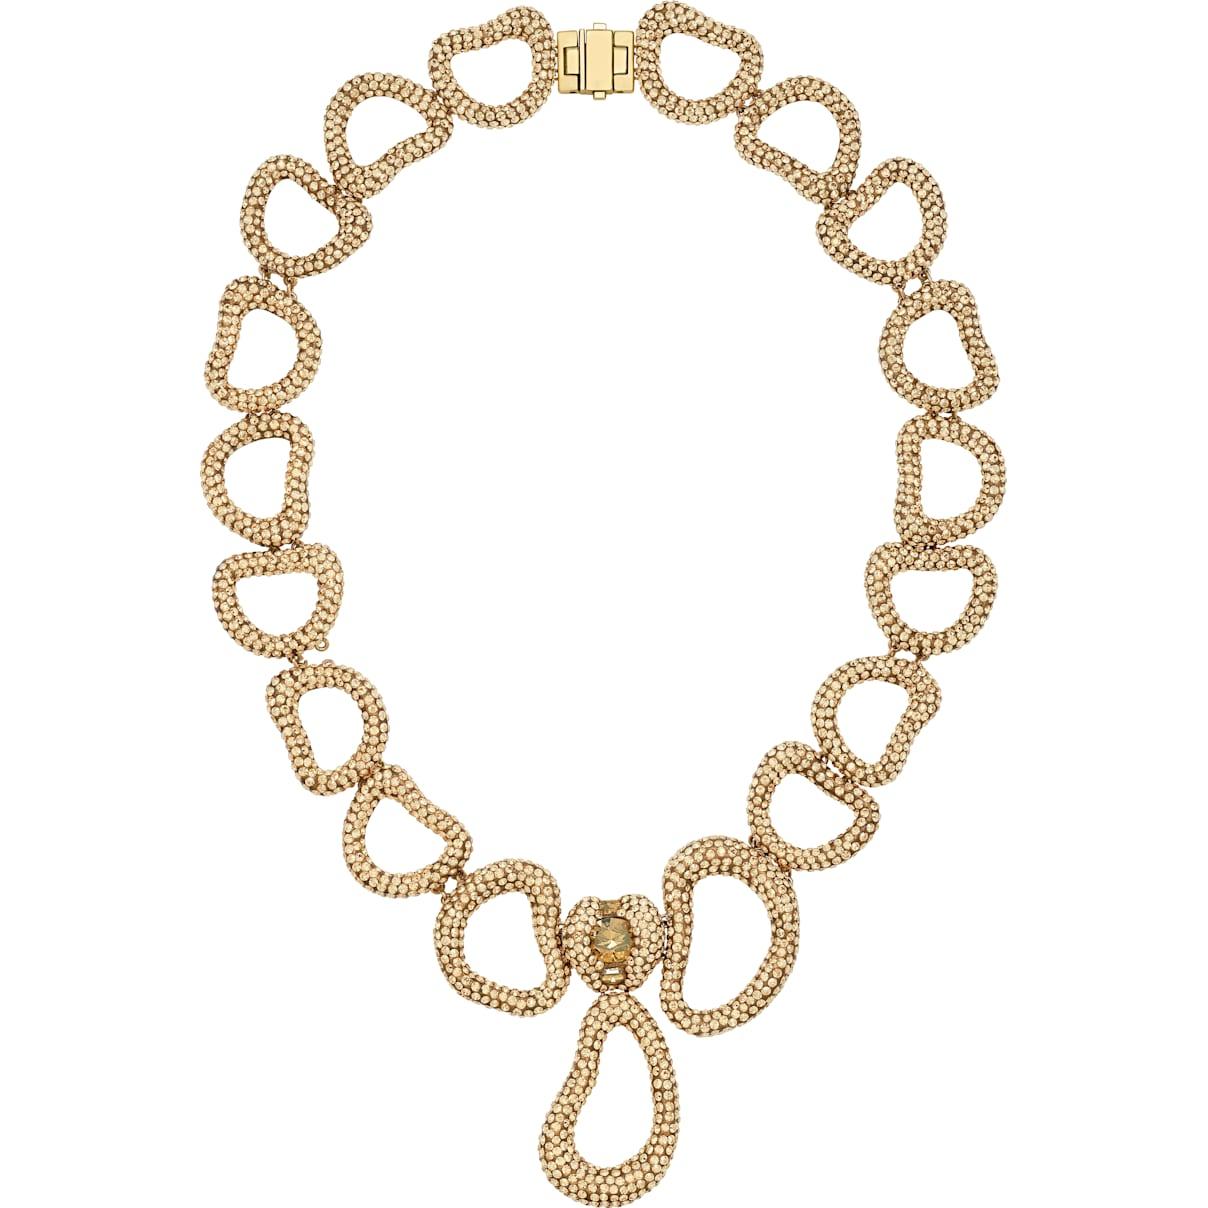 Swarovski Tigris Statement Necklace, Brown, Gold-tone plated